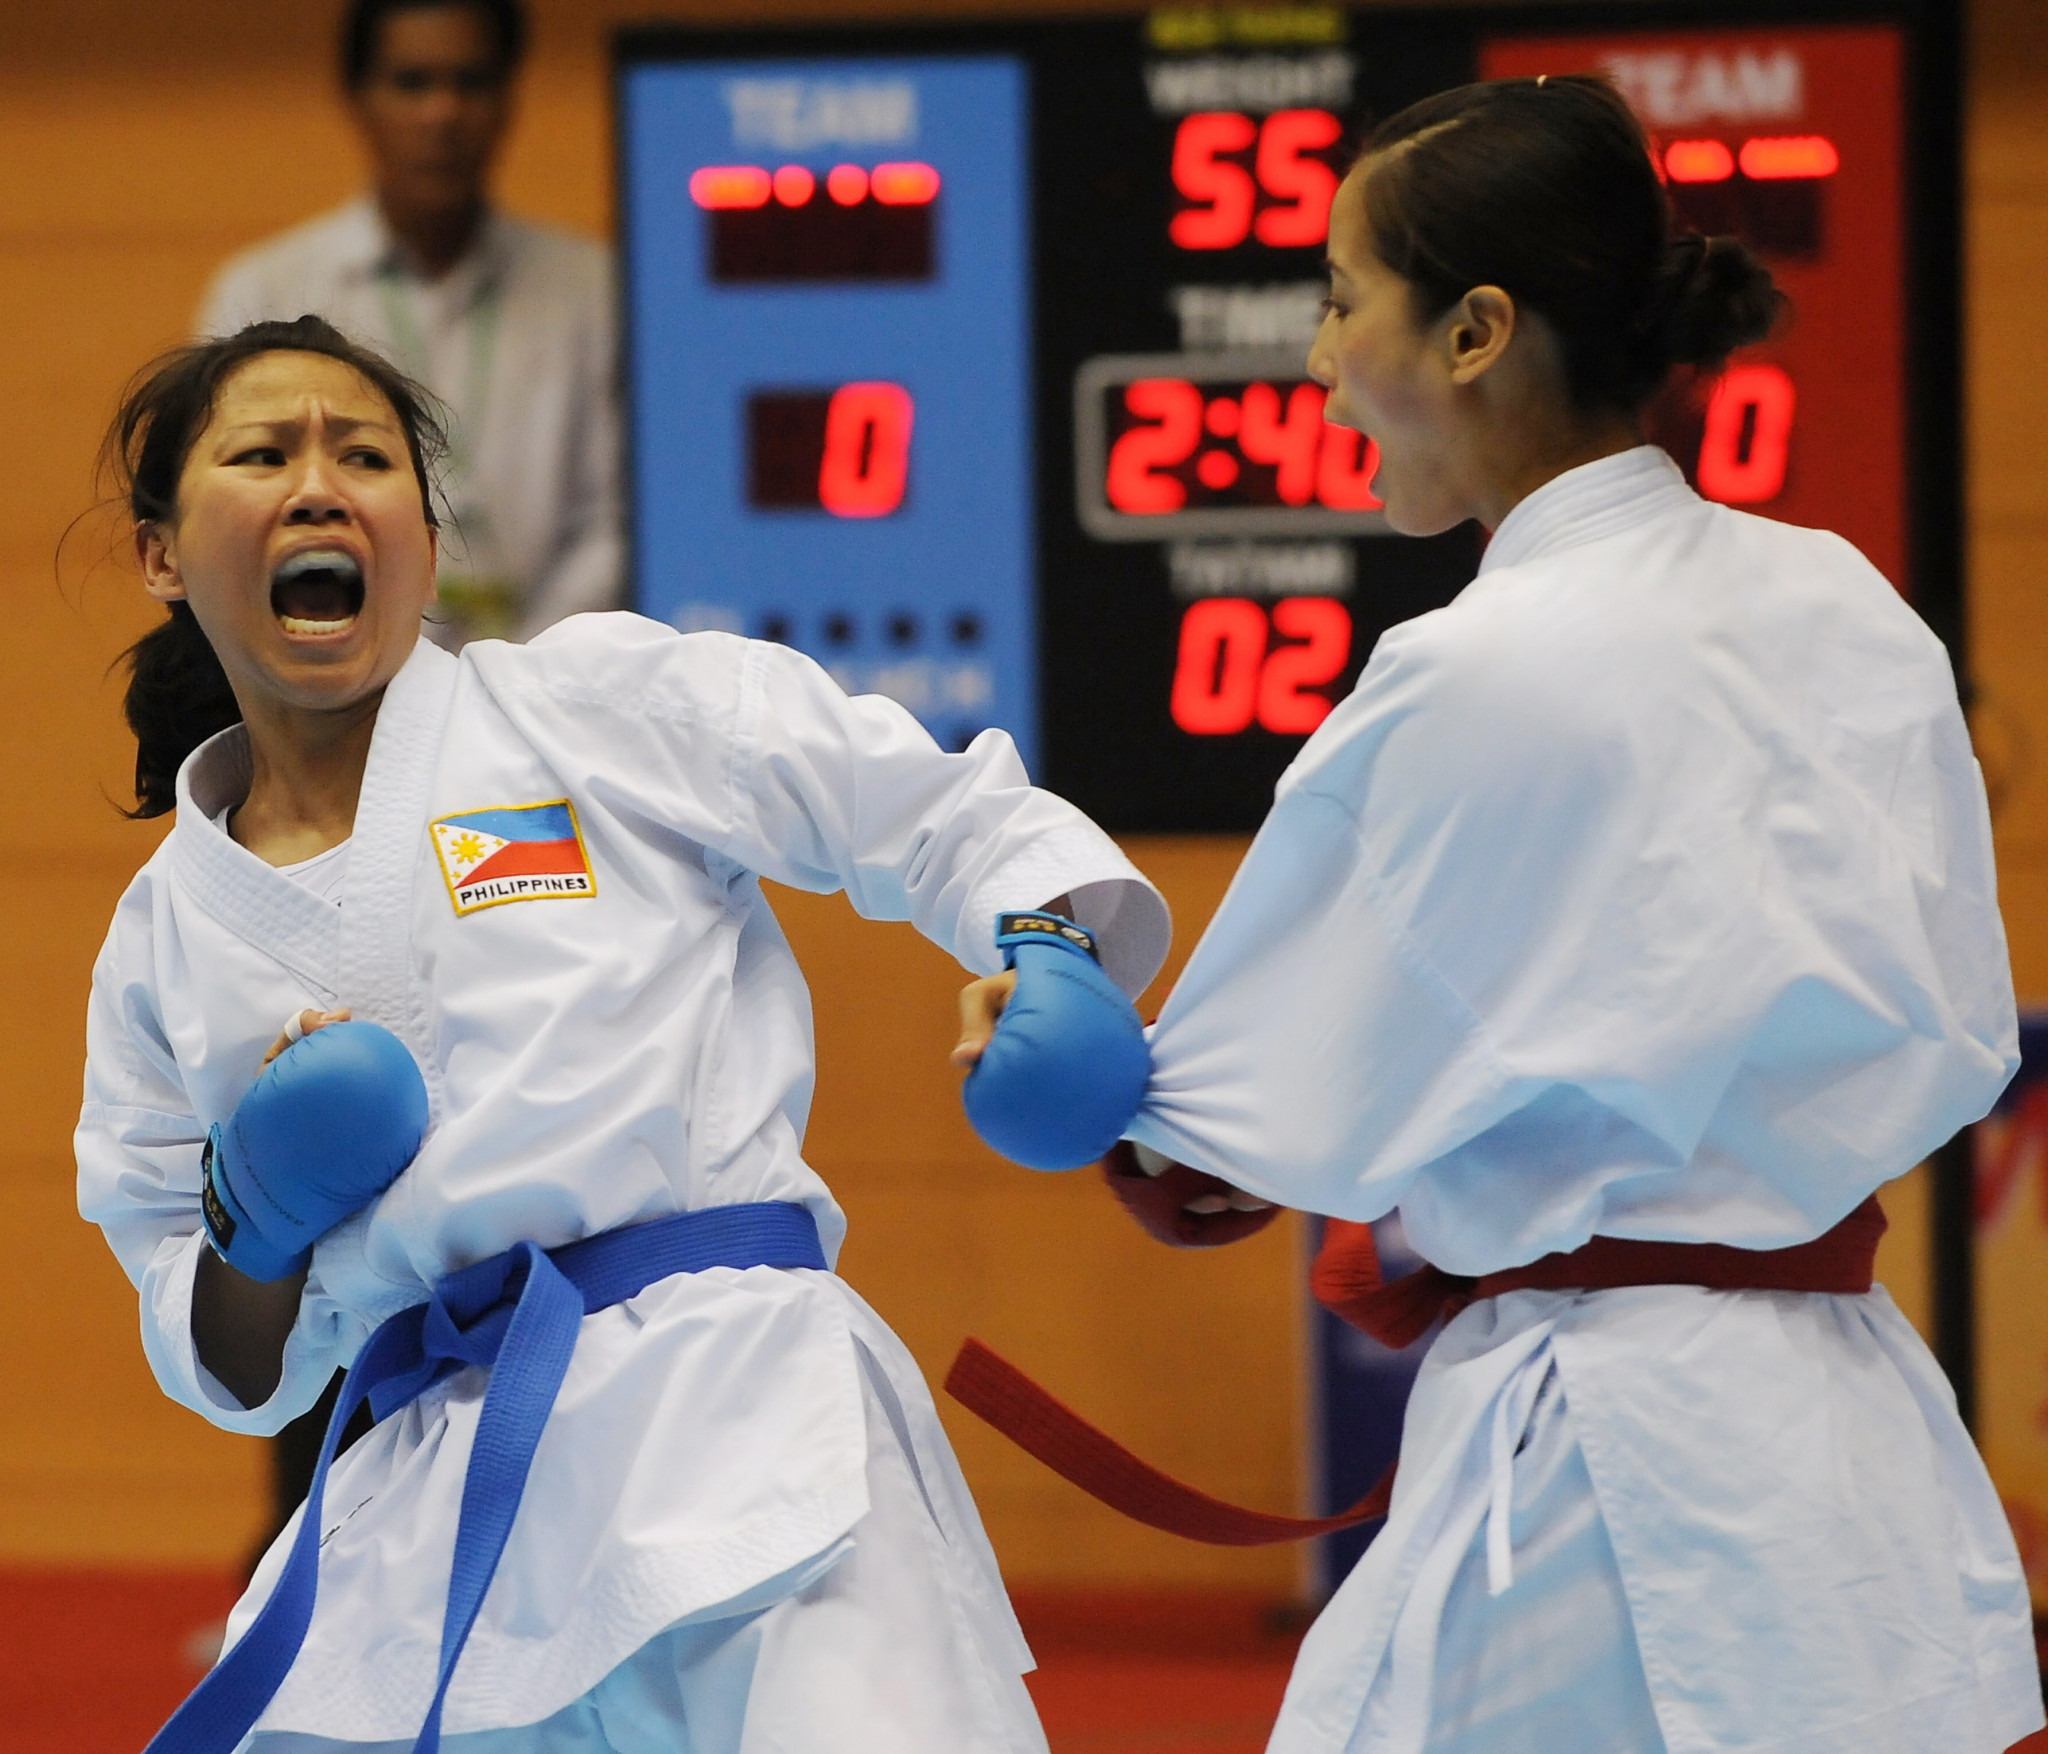 Karate Philippines President confident of athletes reaching Tokyo 2020 despite break in training